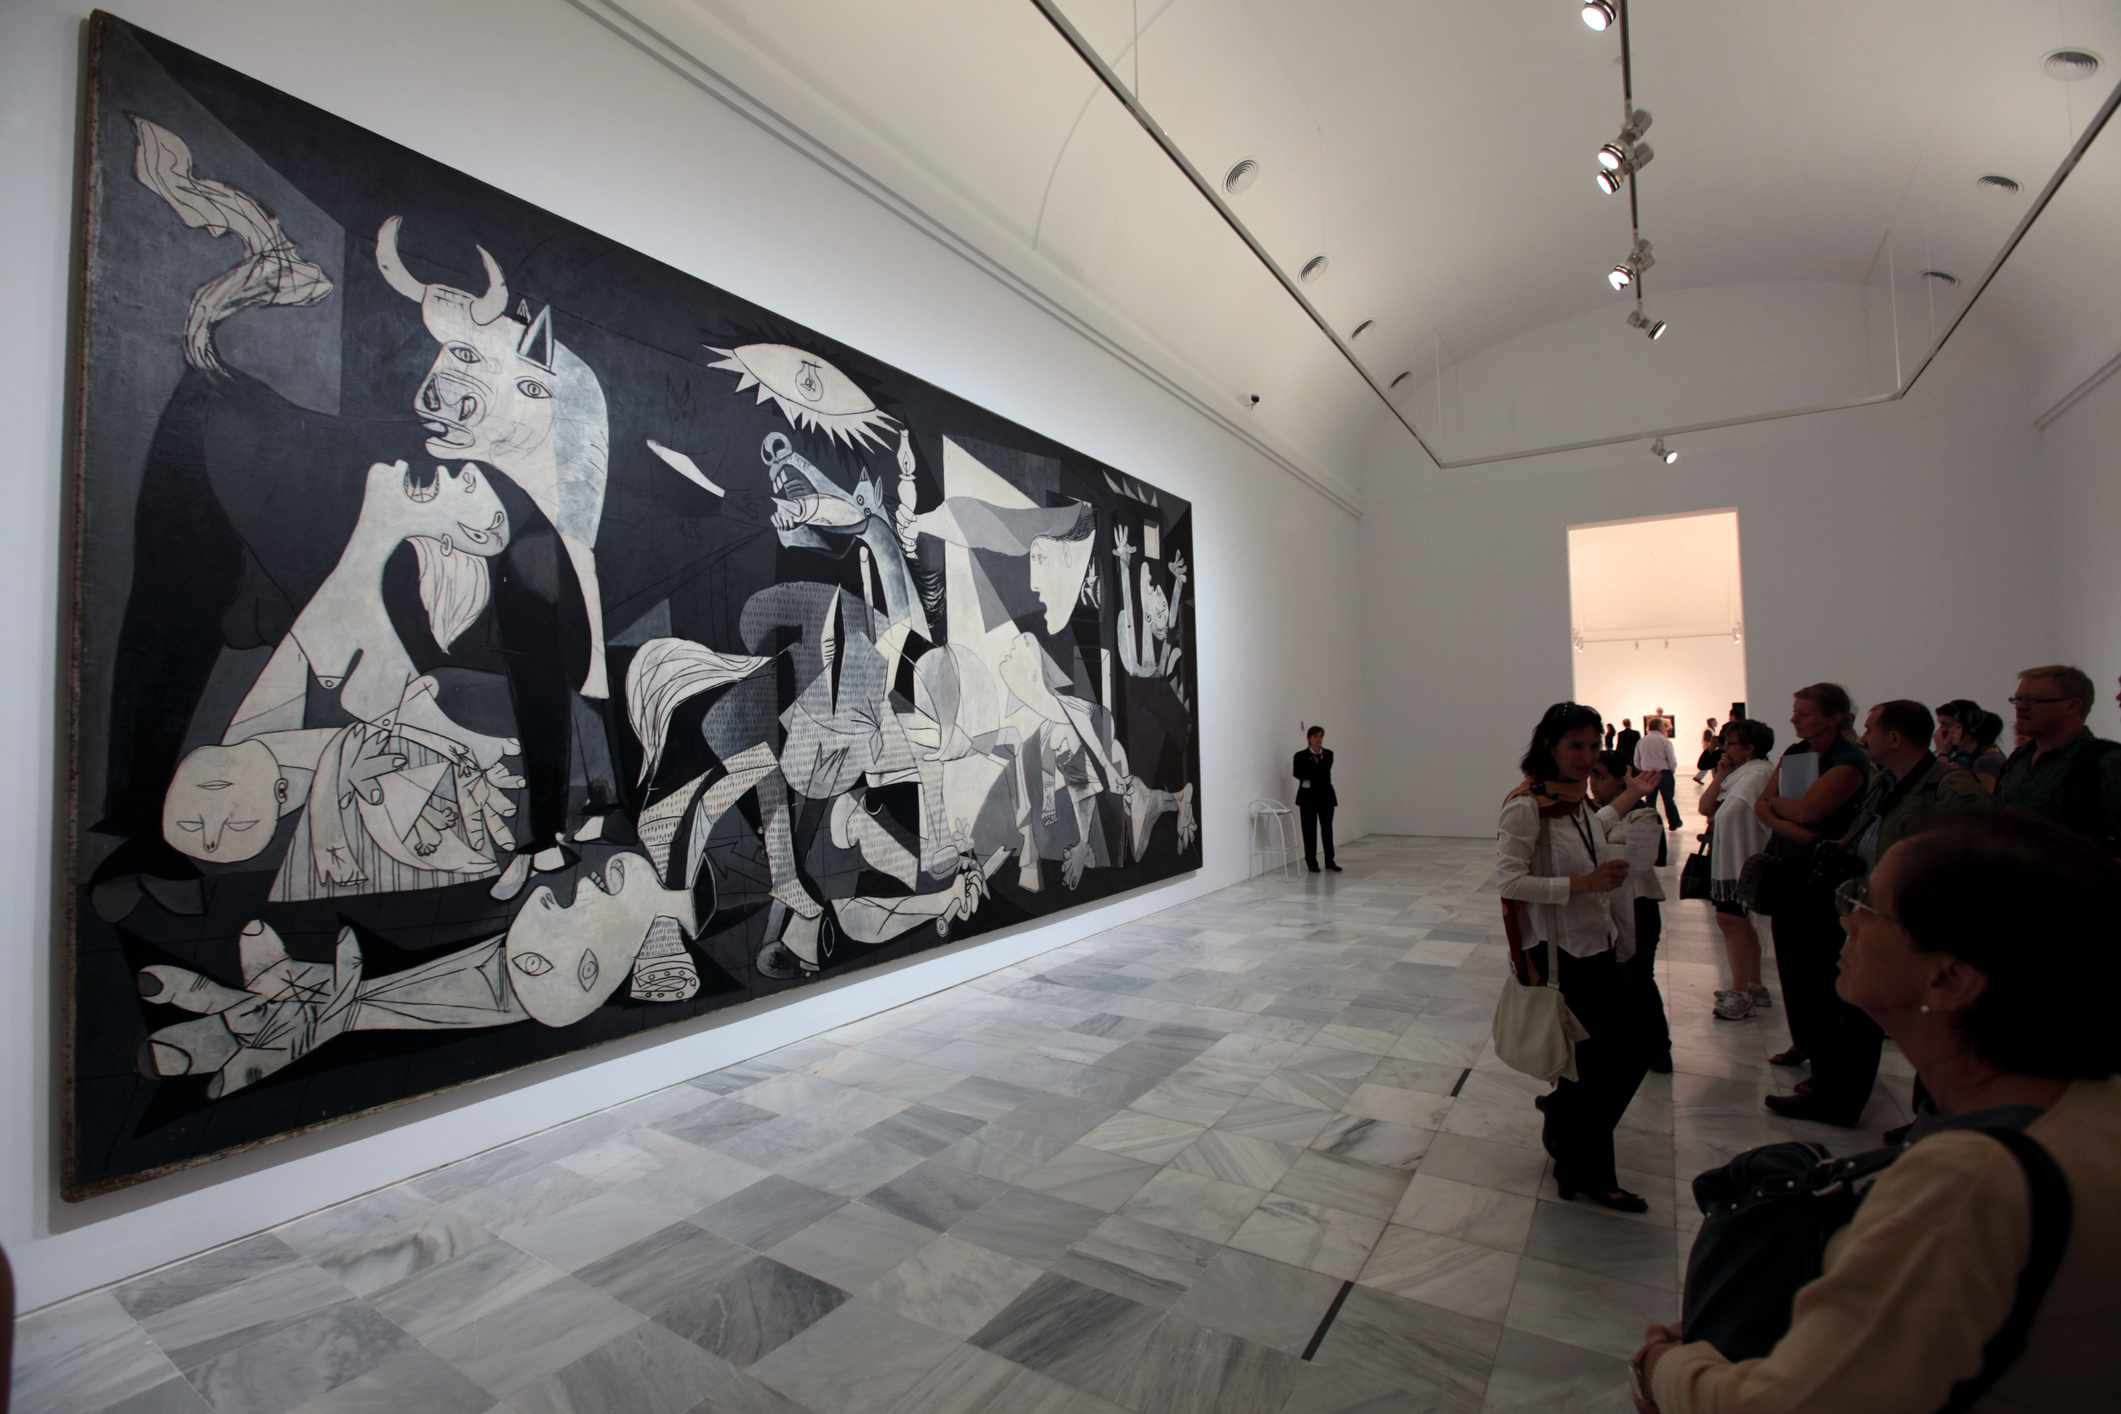 Pablo Picasso's Guernica in Reina Sofia National Art Museum